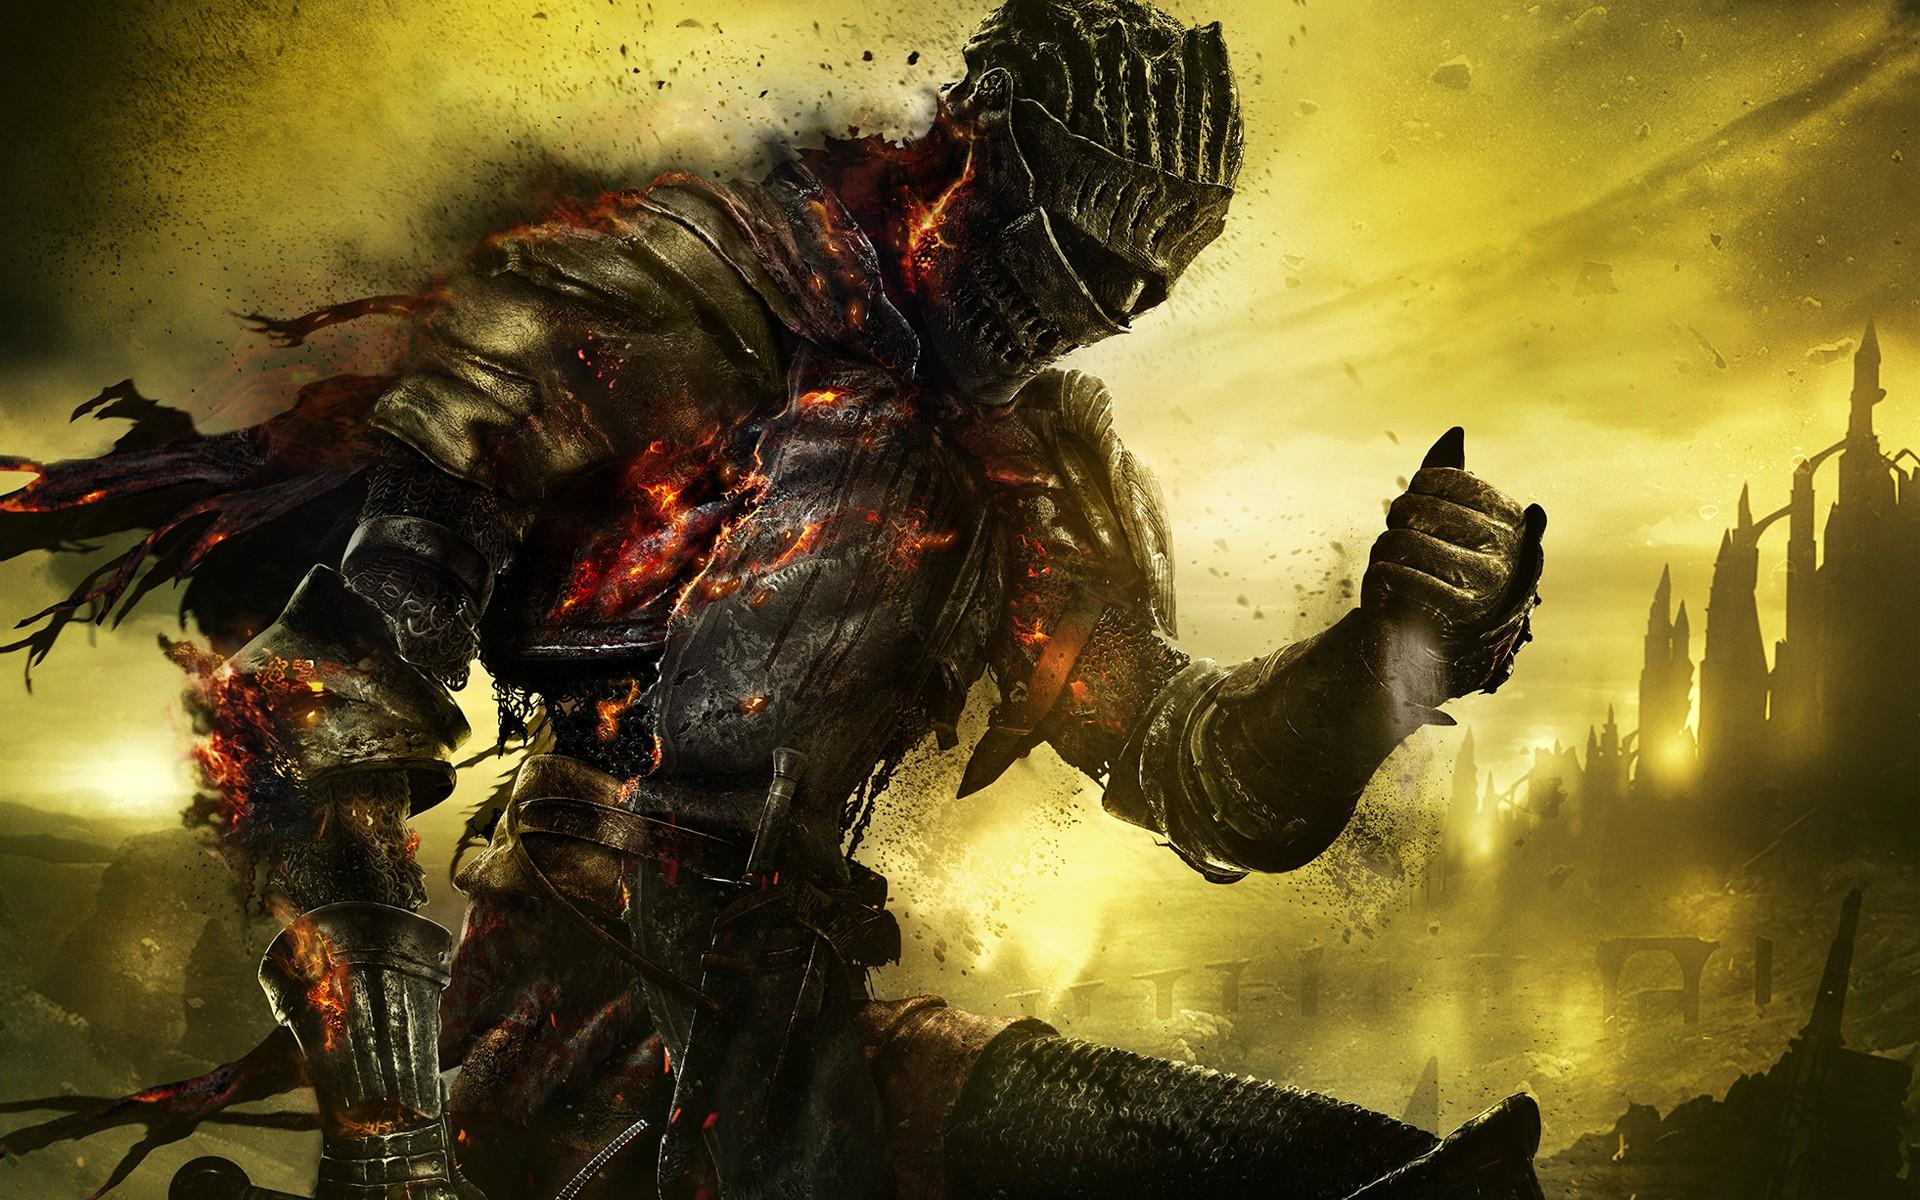 Wallpaper Video Games Artwork Dark Souls Iii Dark Souls